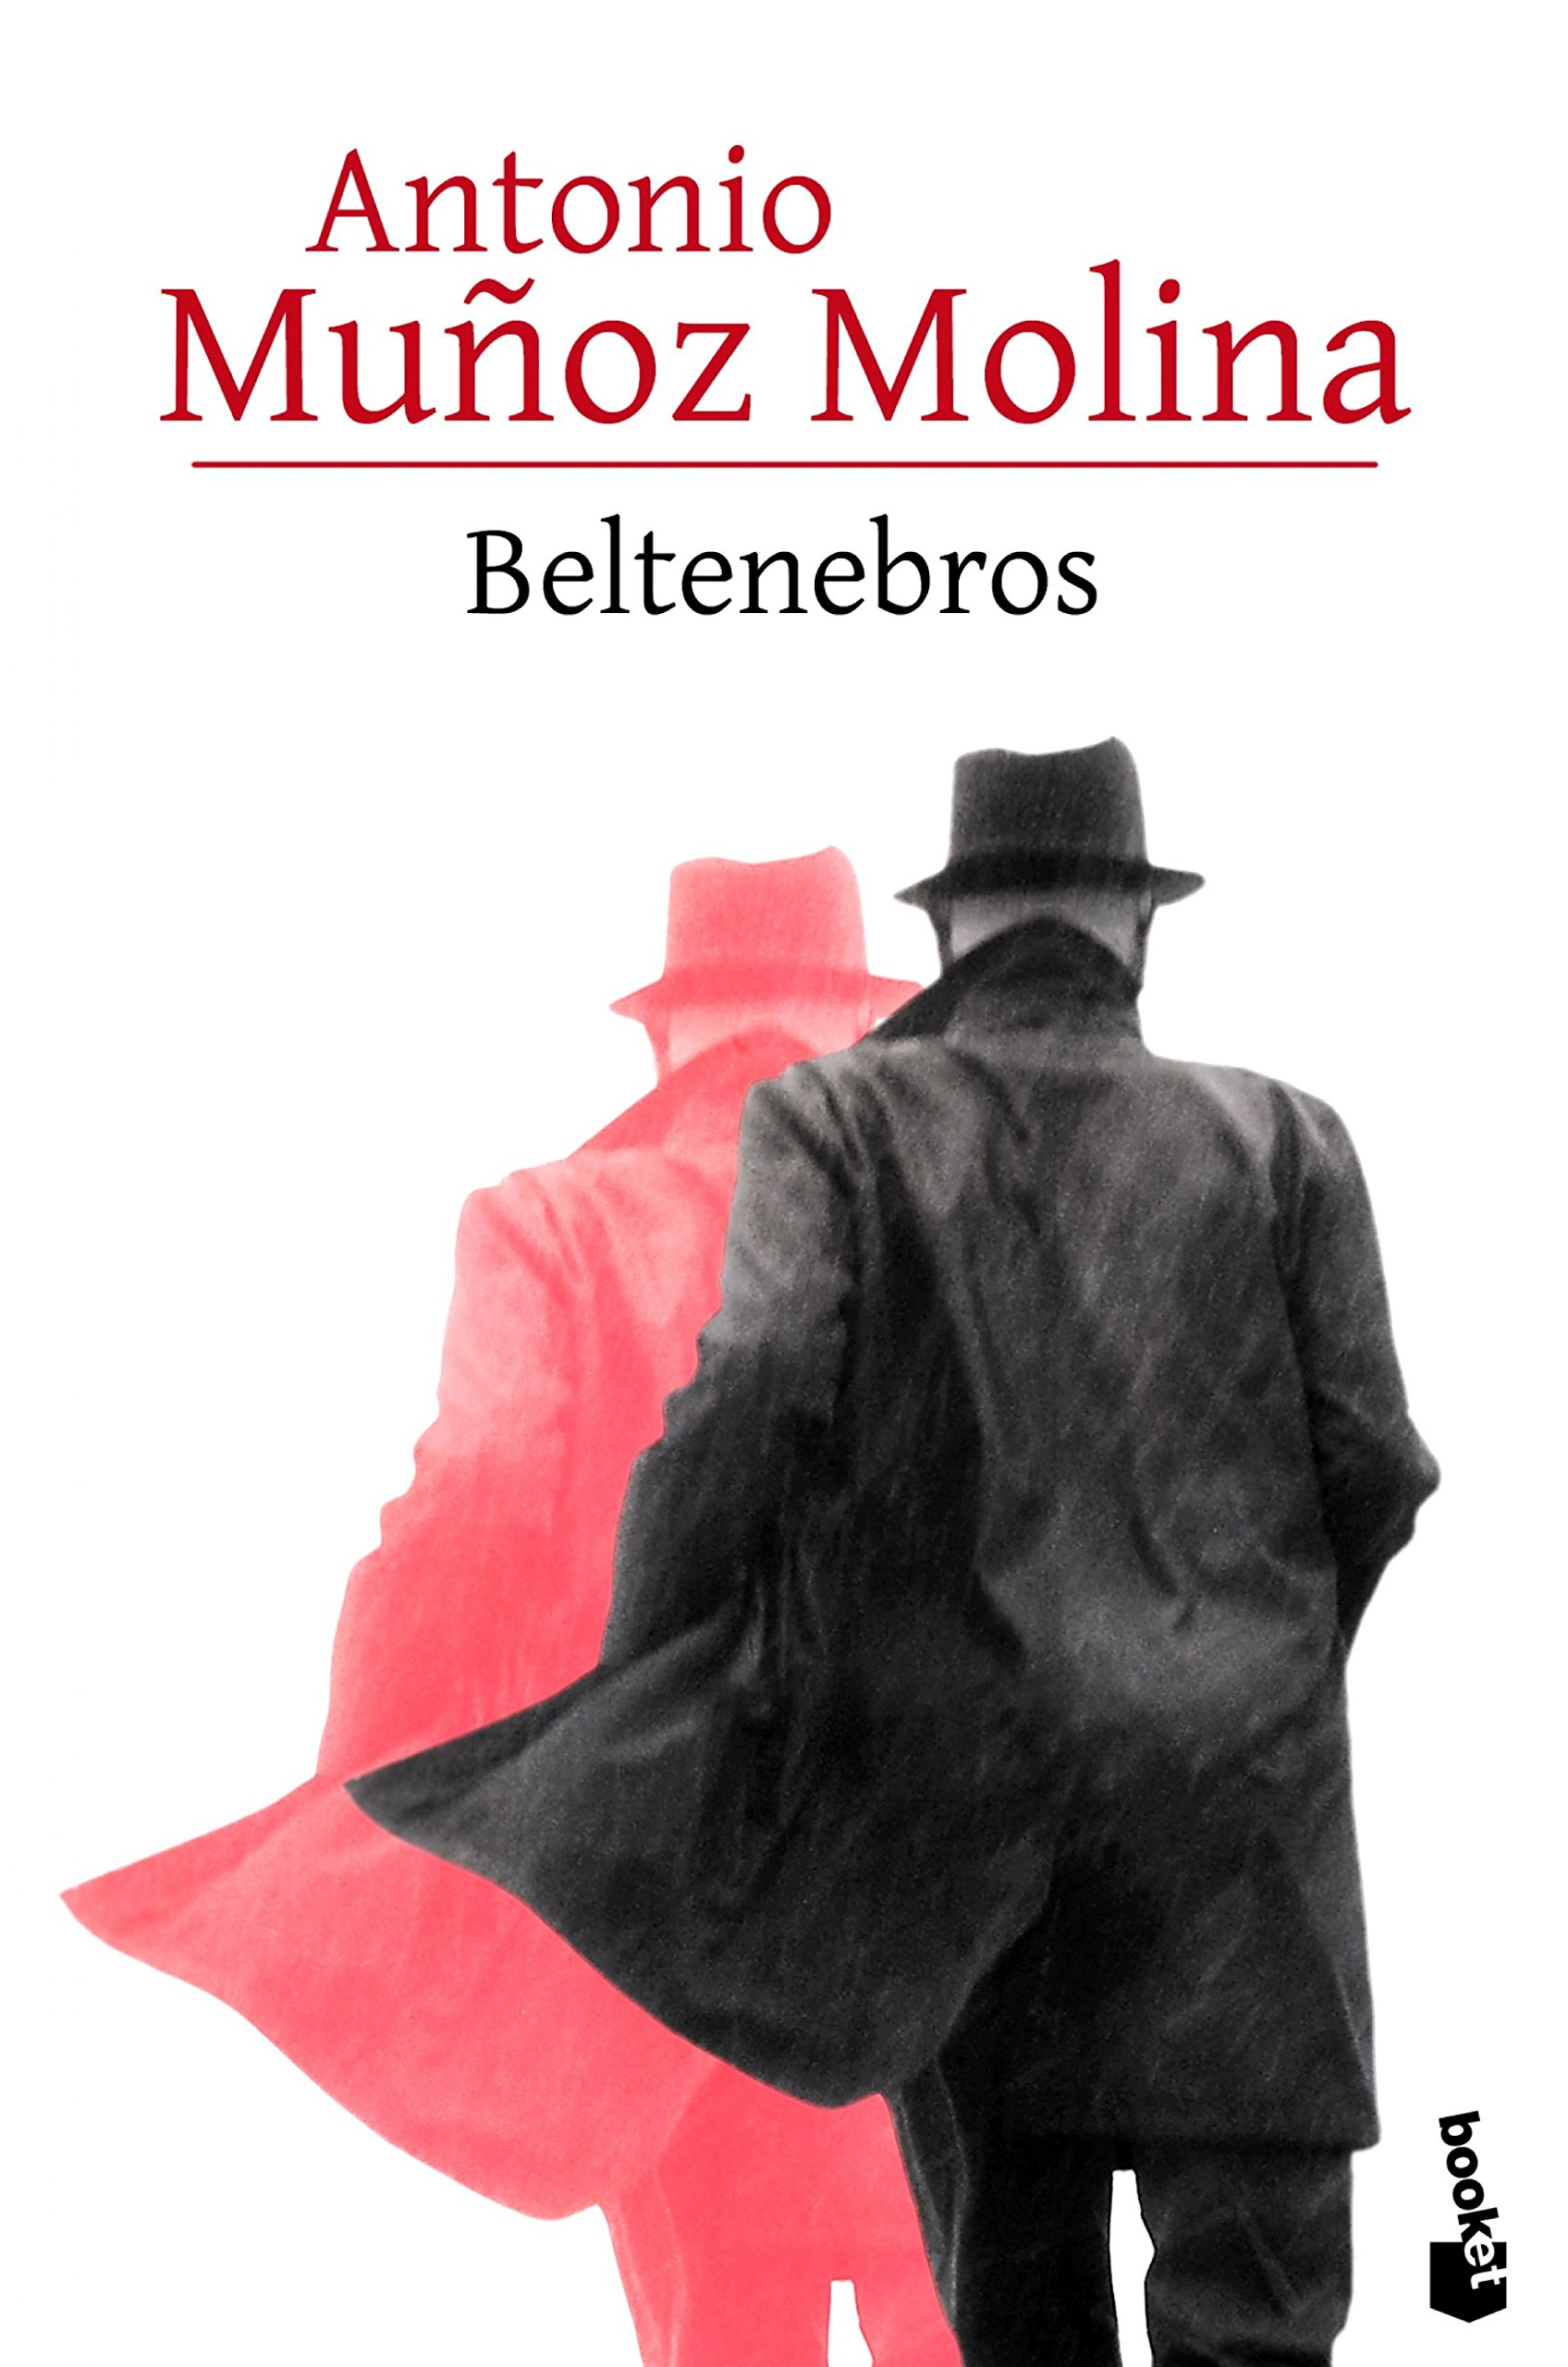 Beltenebros (Biblioteca Antonio Muñoz Molina): Amazon.es: Muñoz Molina, Antonio: Libros